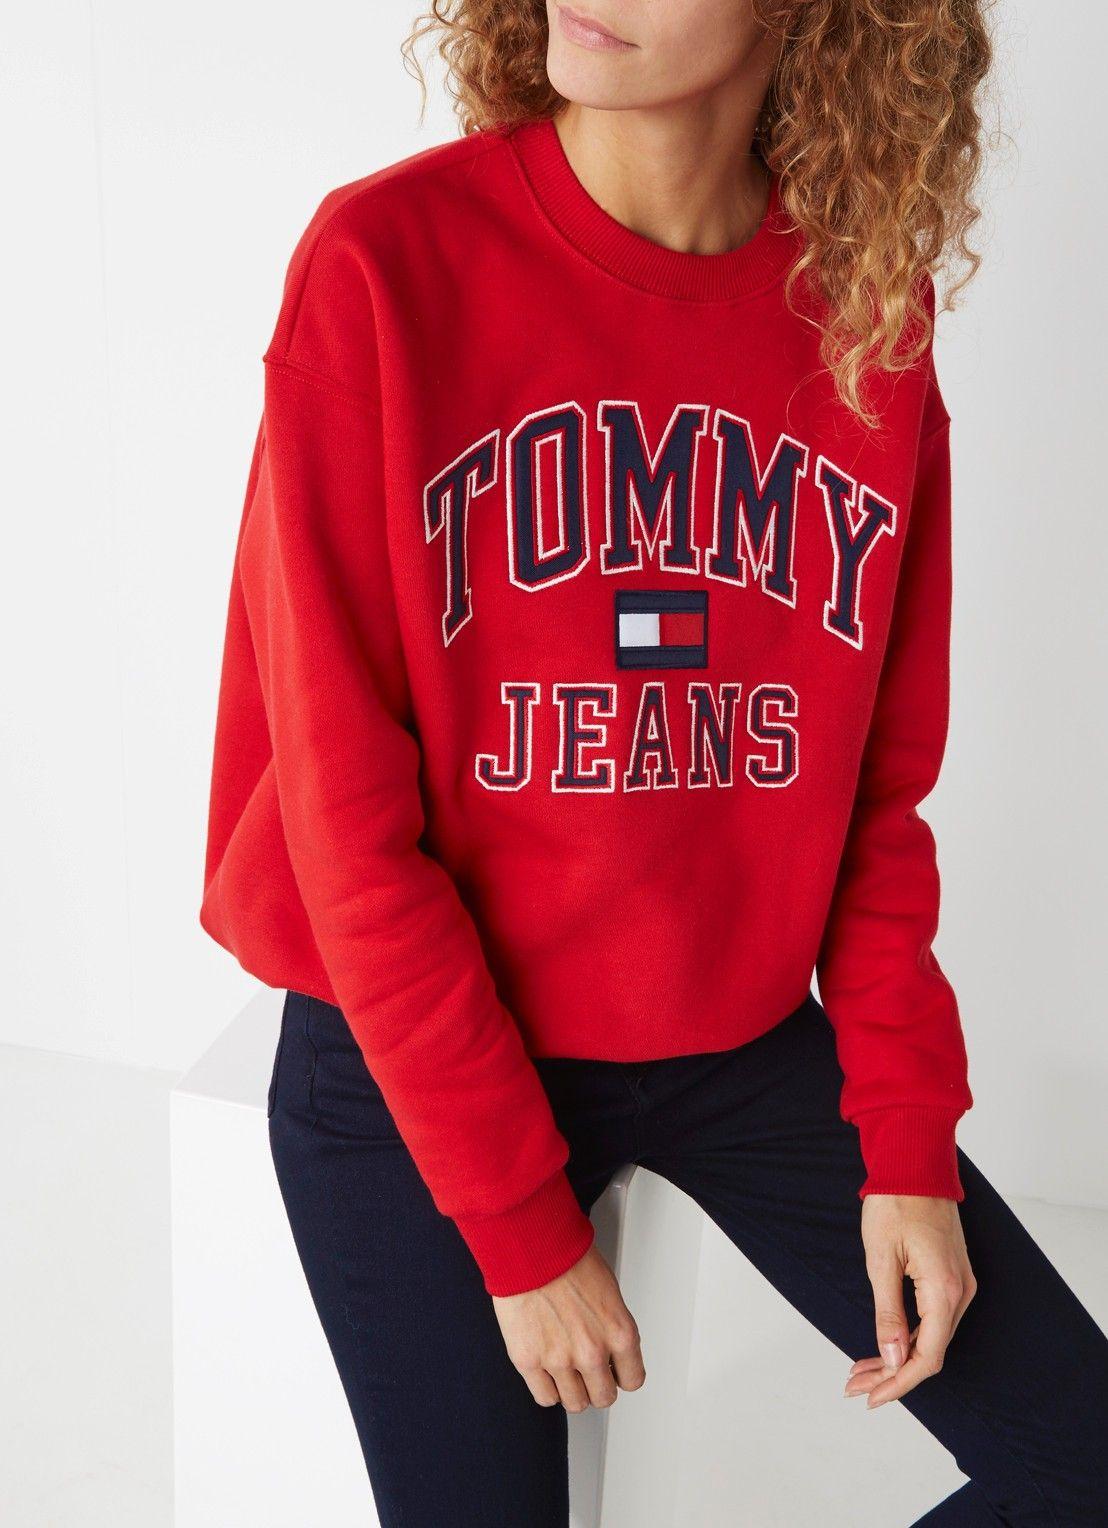 Tommy Hilfiger 90 S Sweater Met Logoprint De Bijenkorf Hilfiger Outfits Tommy Hilfiger Outfit Clothes [ 1528 x 1108 Pixel ]